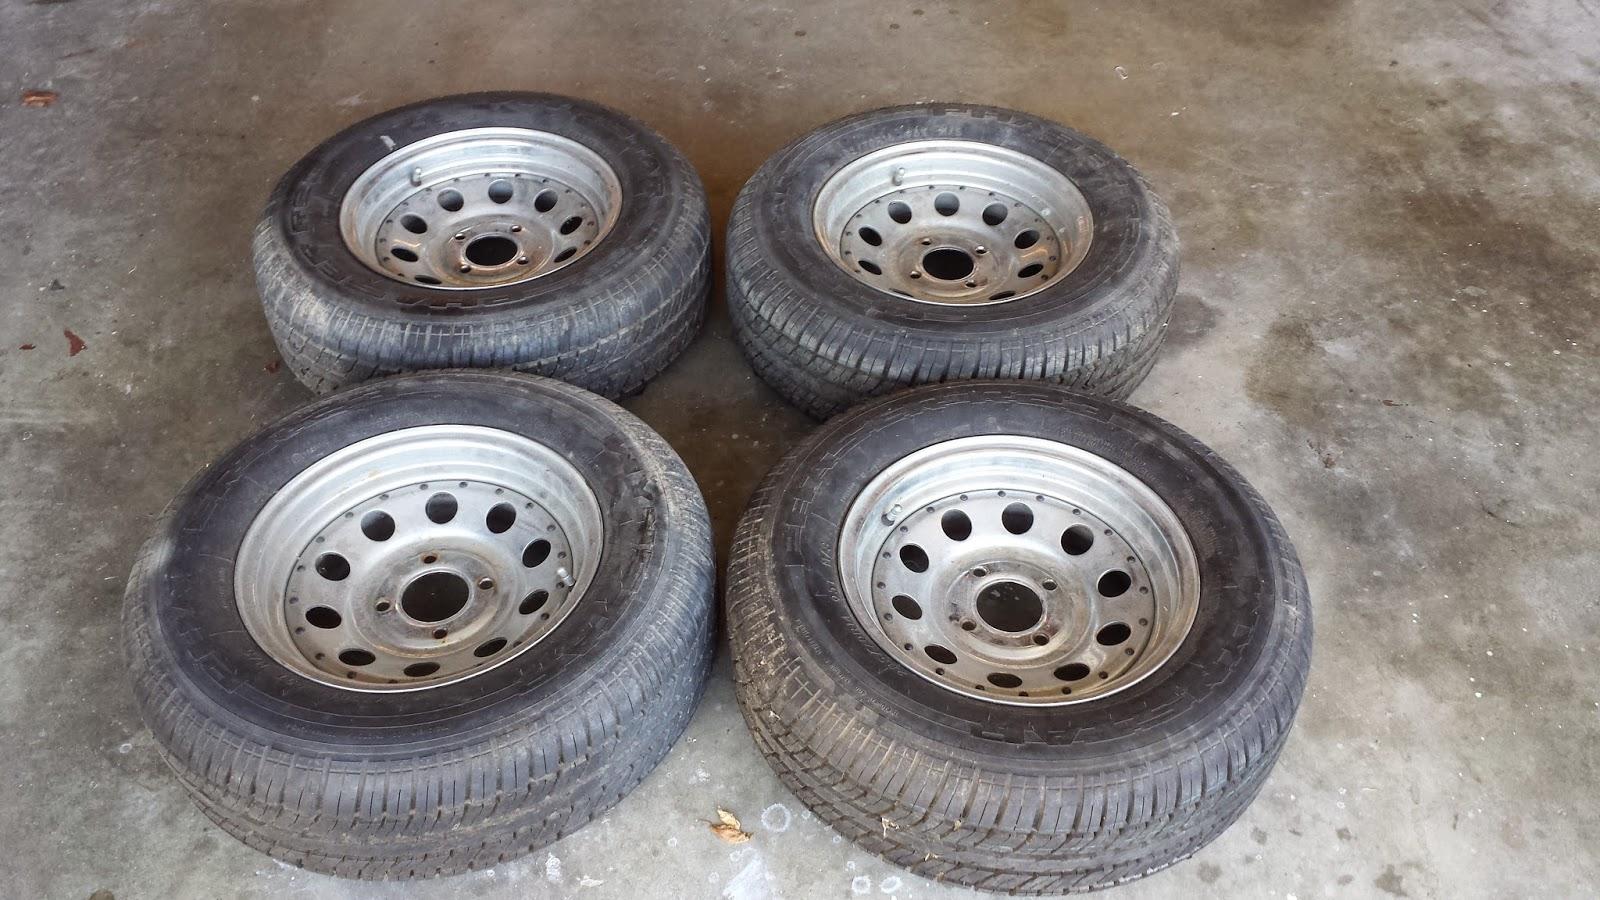 Garage: Wheel Polishing with Bar Keepers Friend | DIY Phil